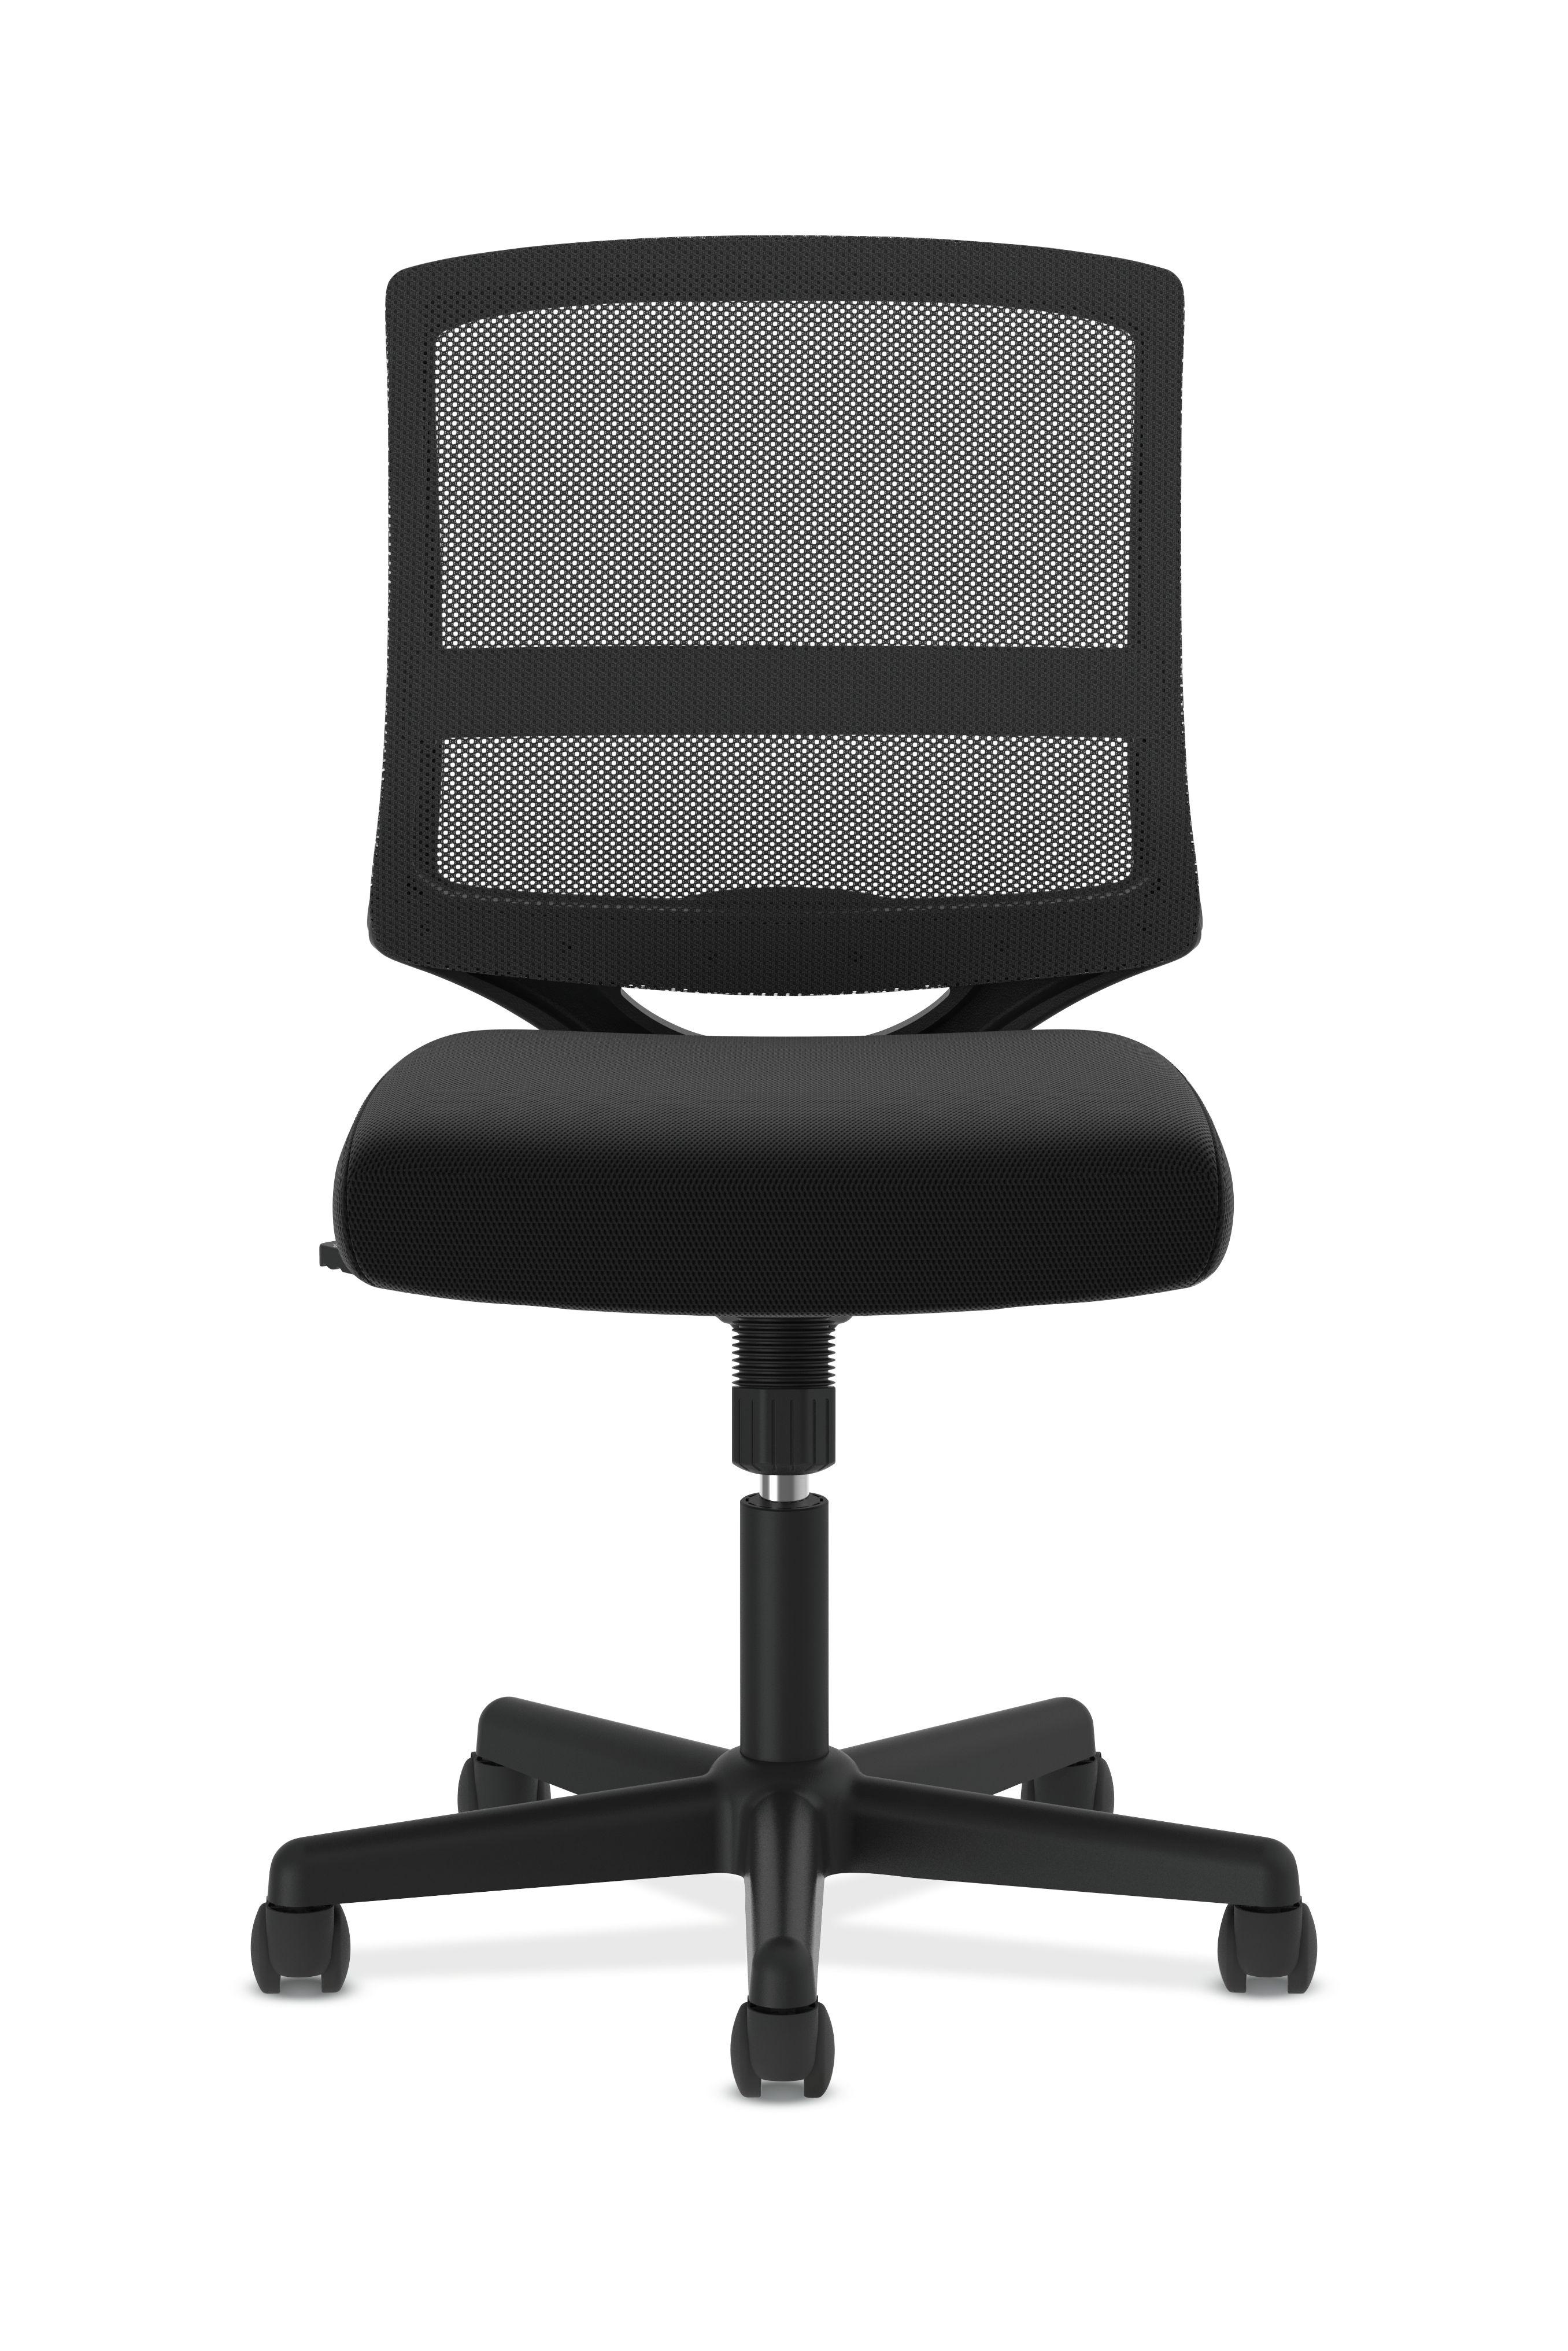 Genial HON ValuTask Mid Back Mesh Task Chair, Armless Black Mesh Computer Chair  (HVL206)